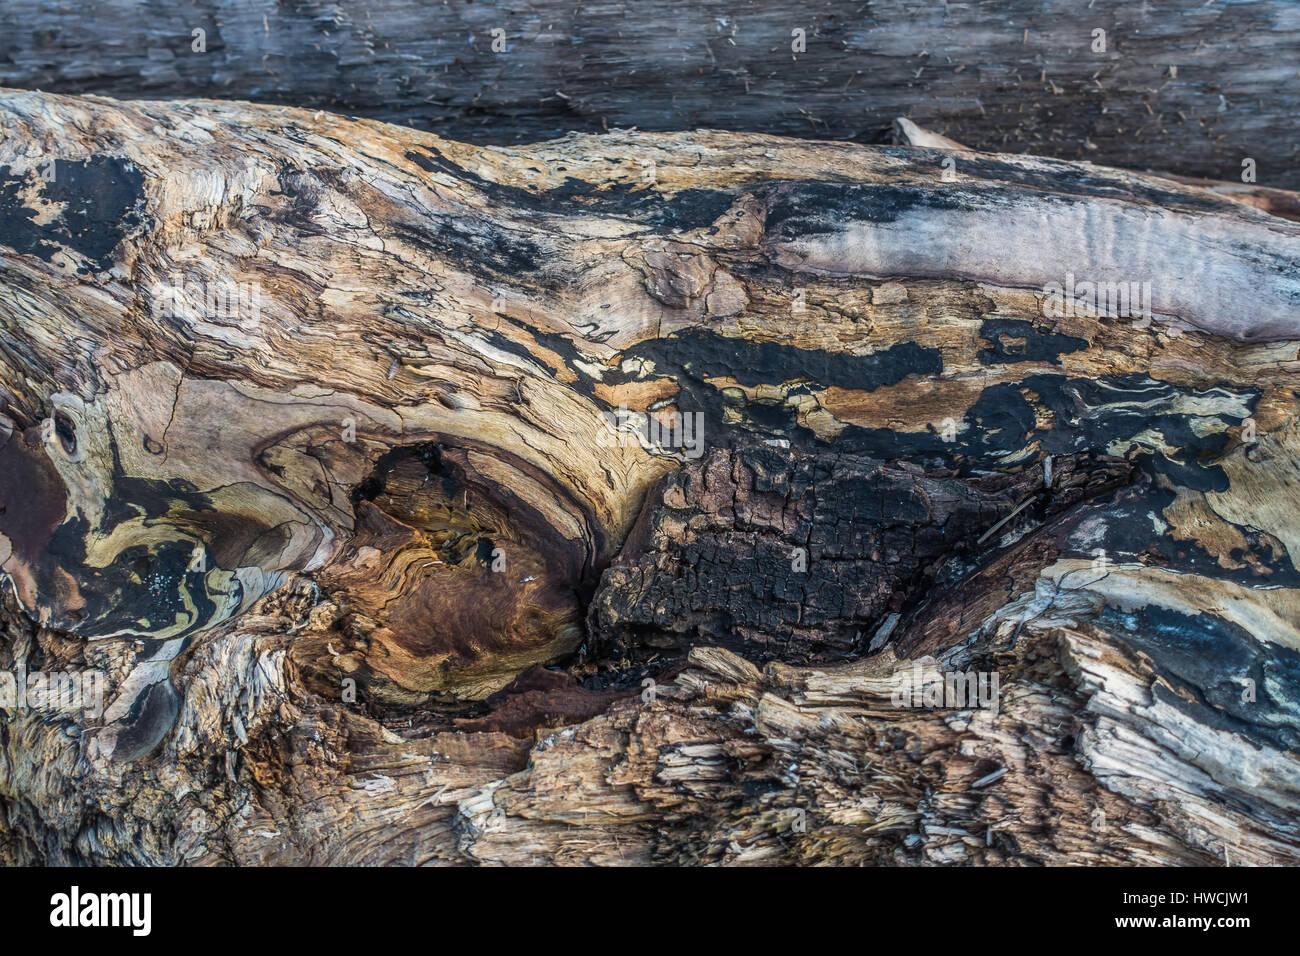 A closeup shot of a warped driftwood log. - Stock Image